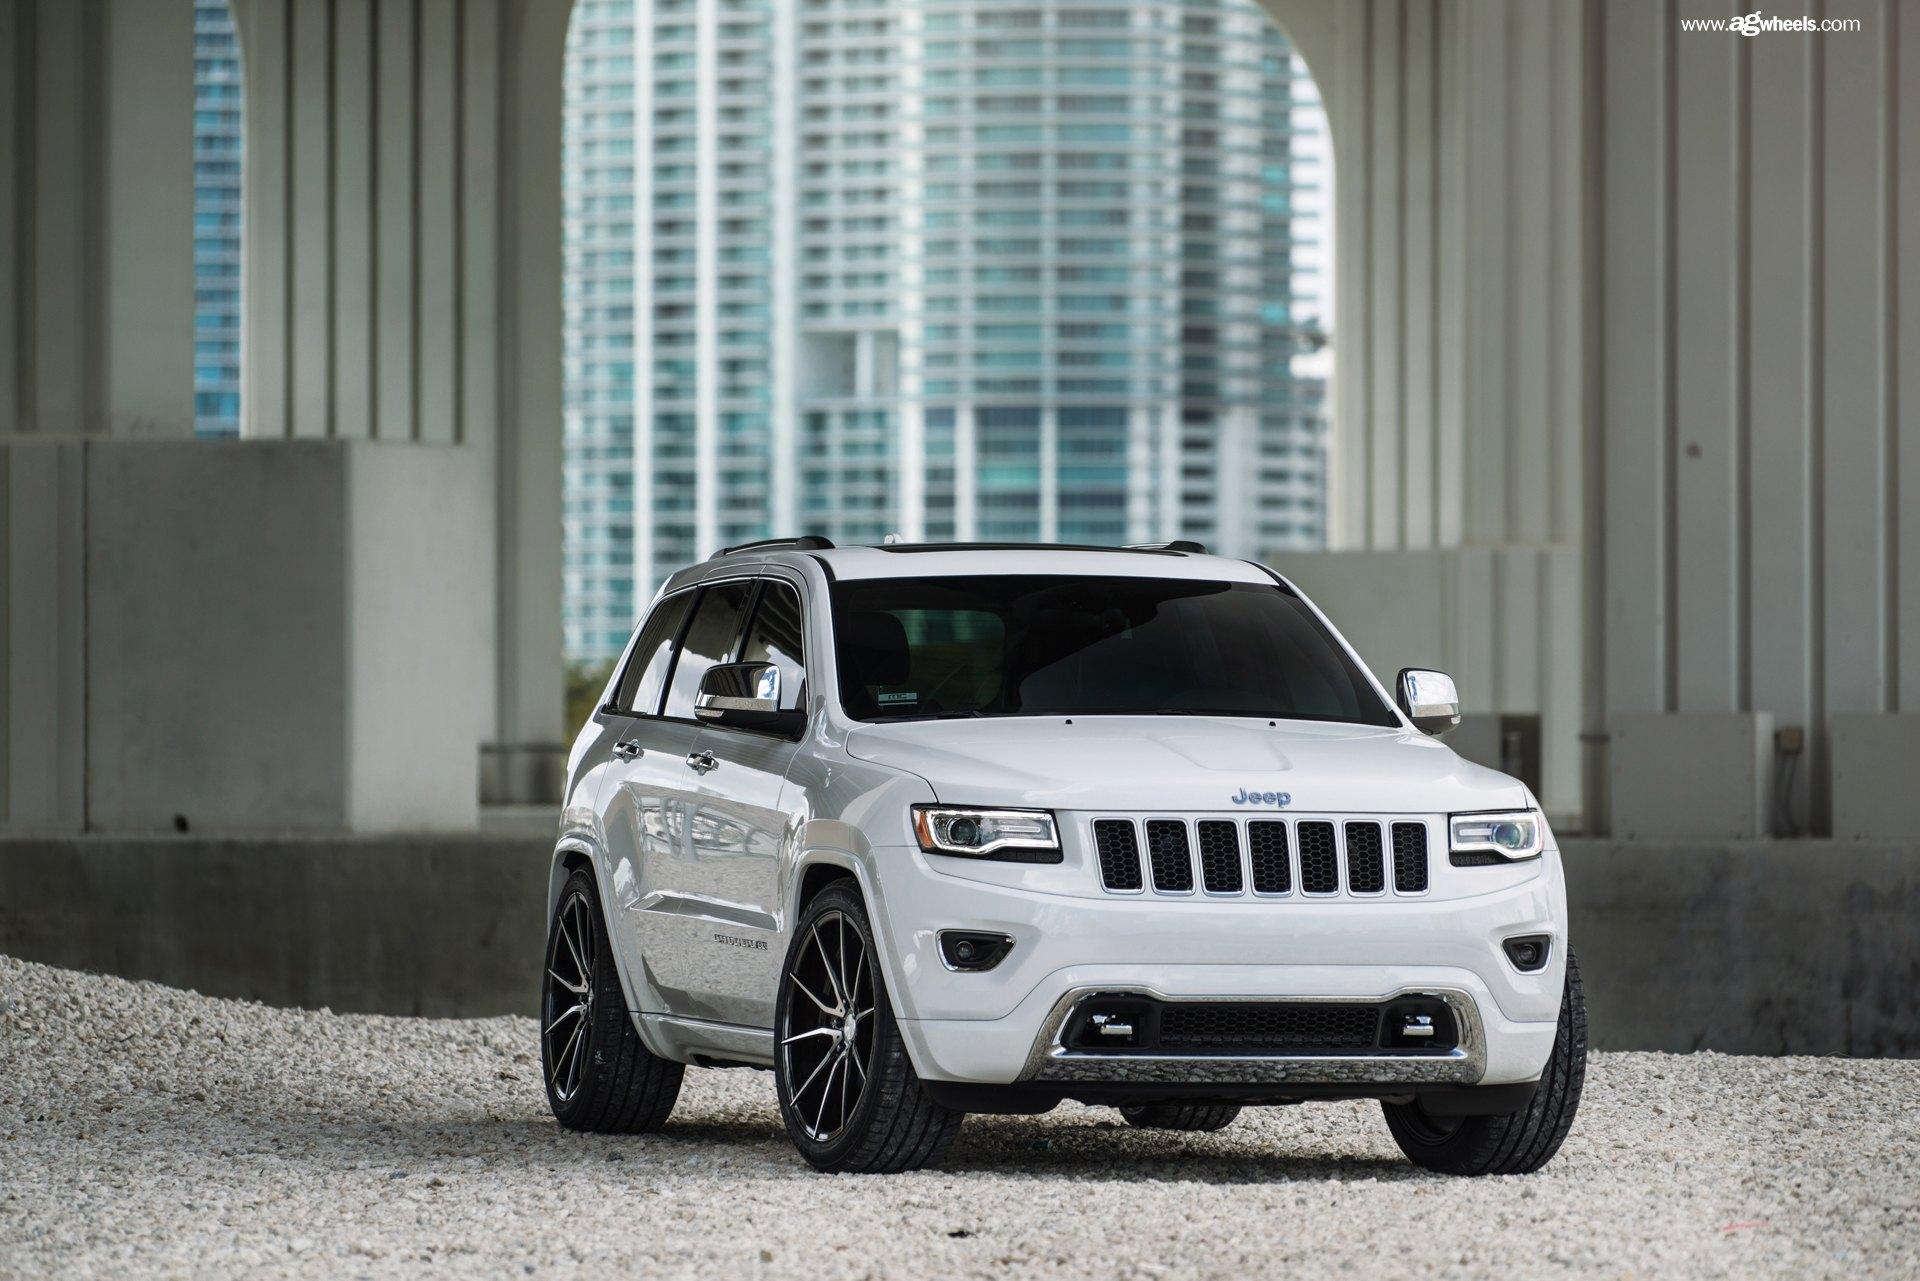 x grand left comparison test road driving suv vs automobile review magazine jeep front news cherokee ss trailblazer chevrolet